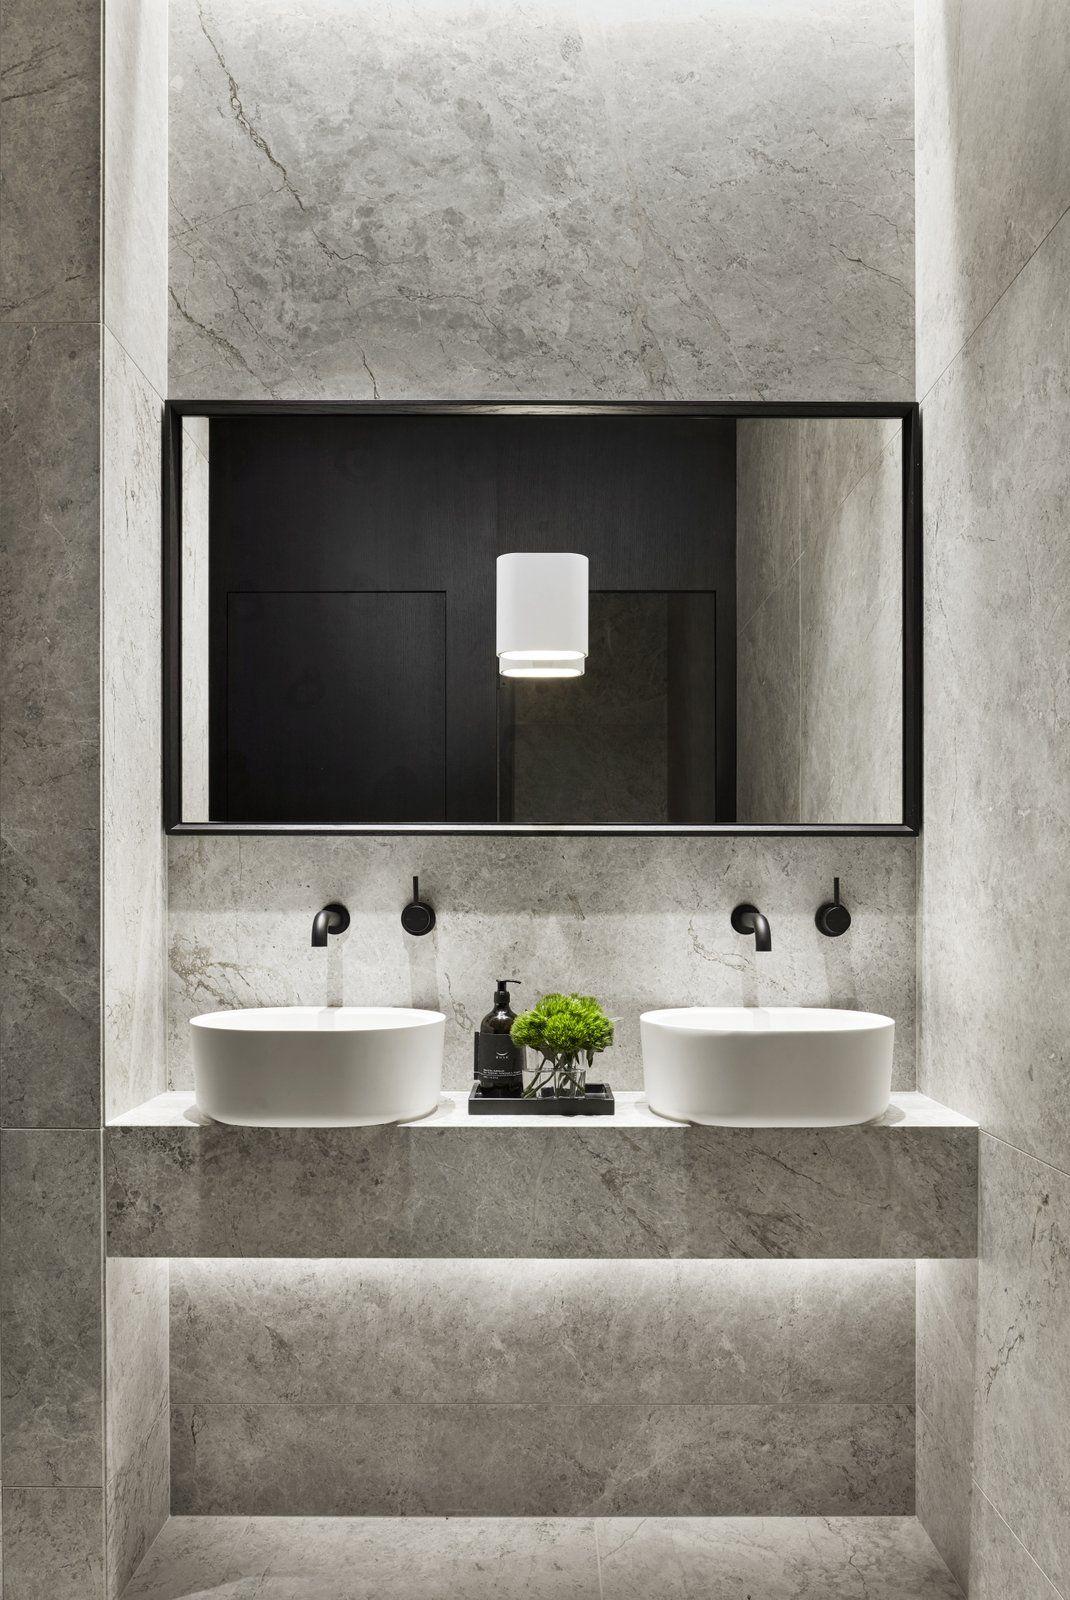 Office Bathroom Designs New Office Tour Pdg Offices  Melbourne  Melbourne Bath And Interiors Design Inspiration